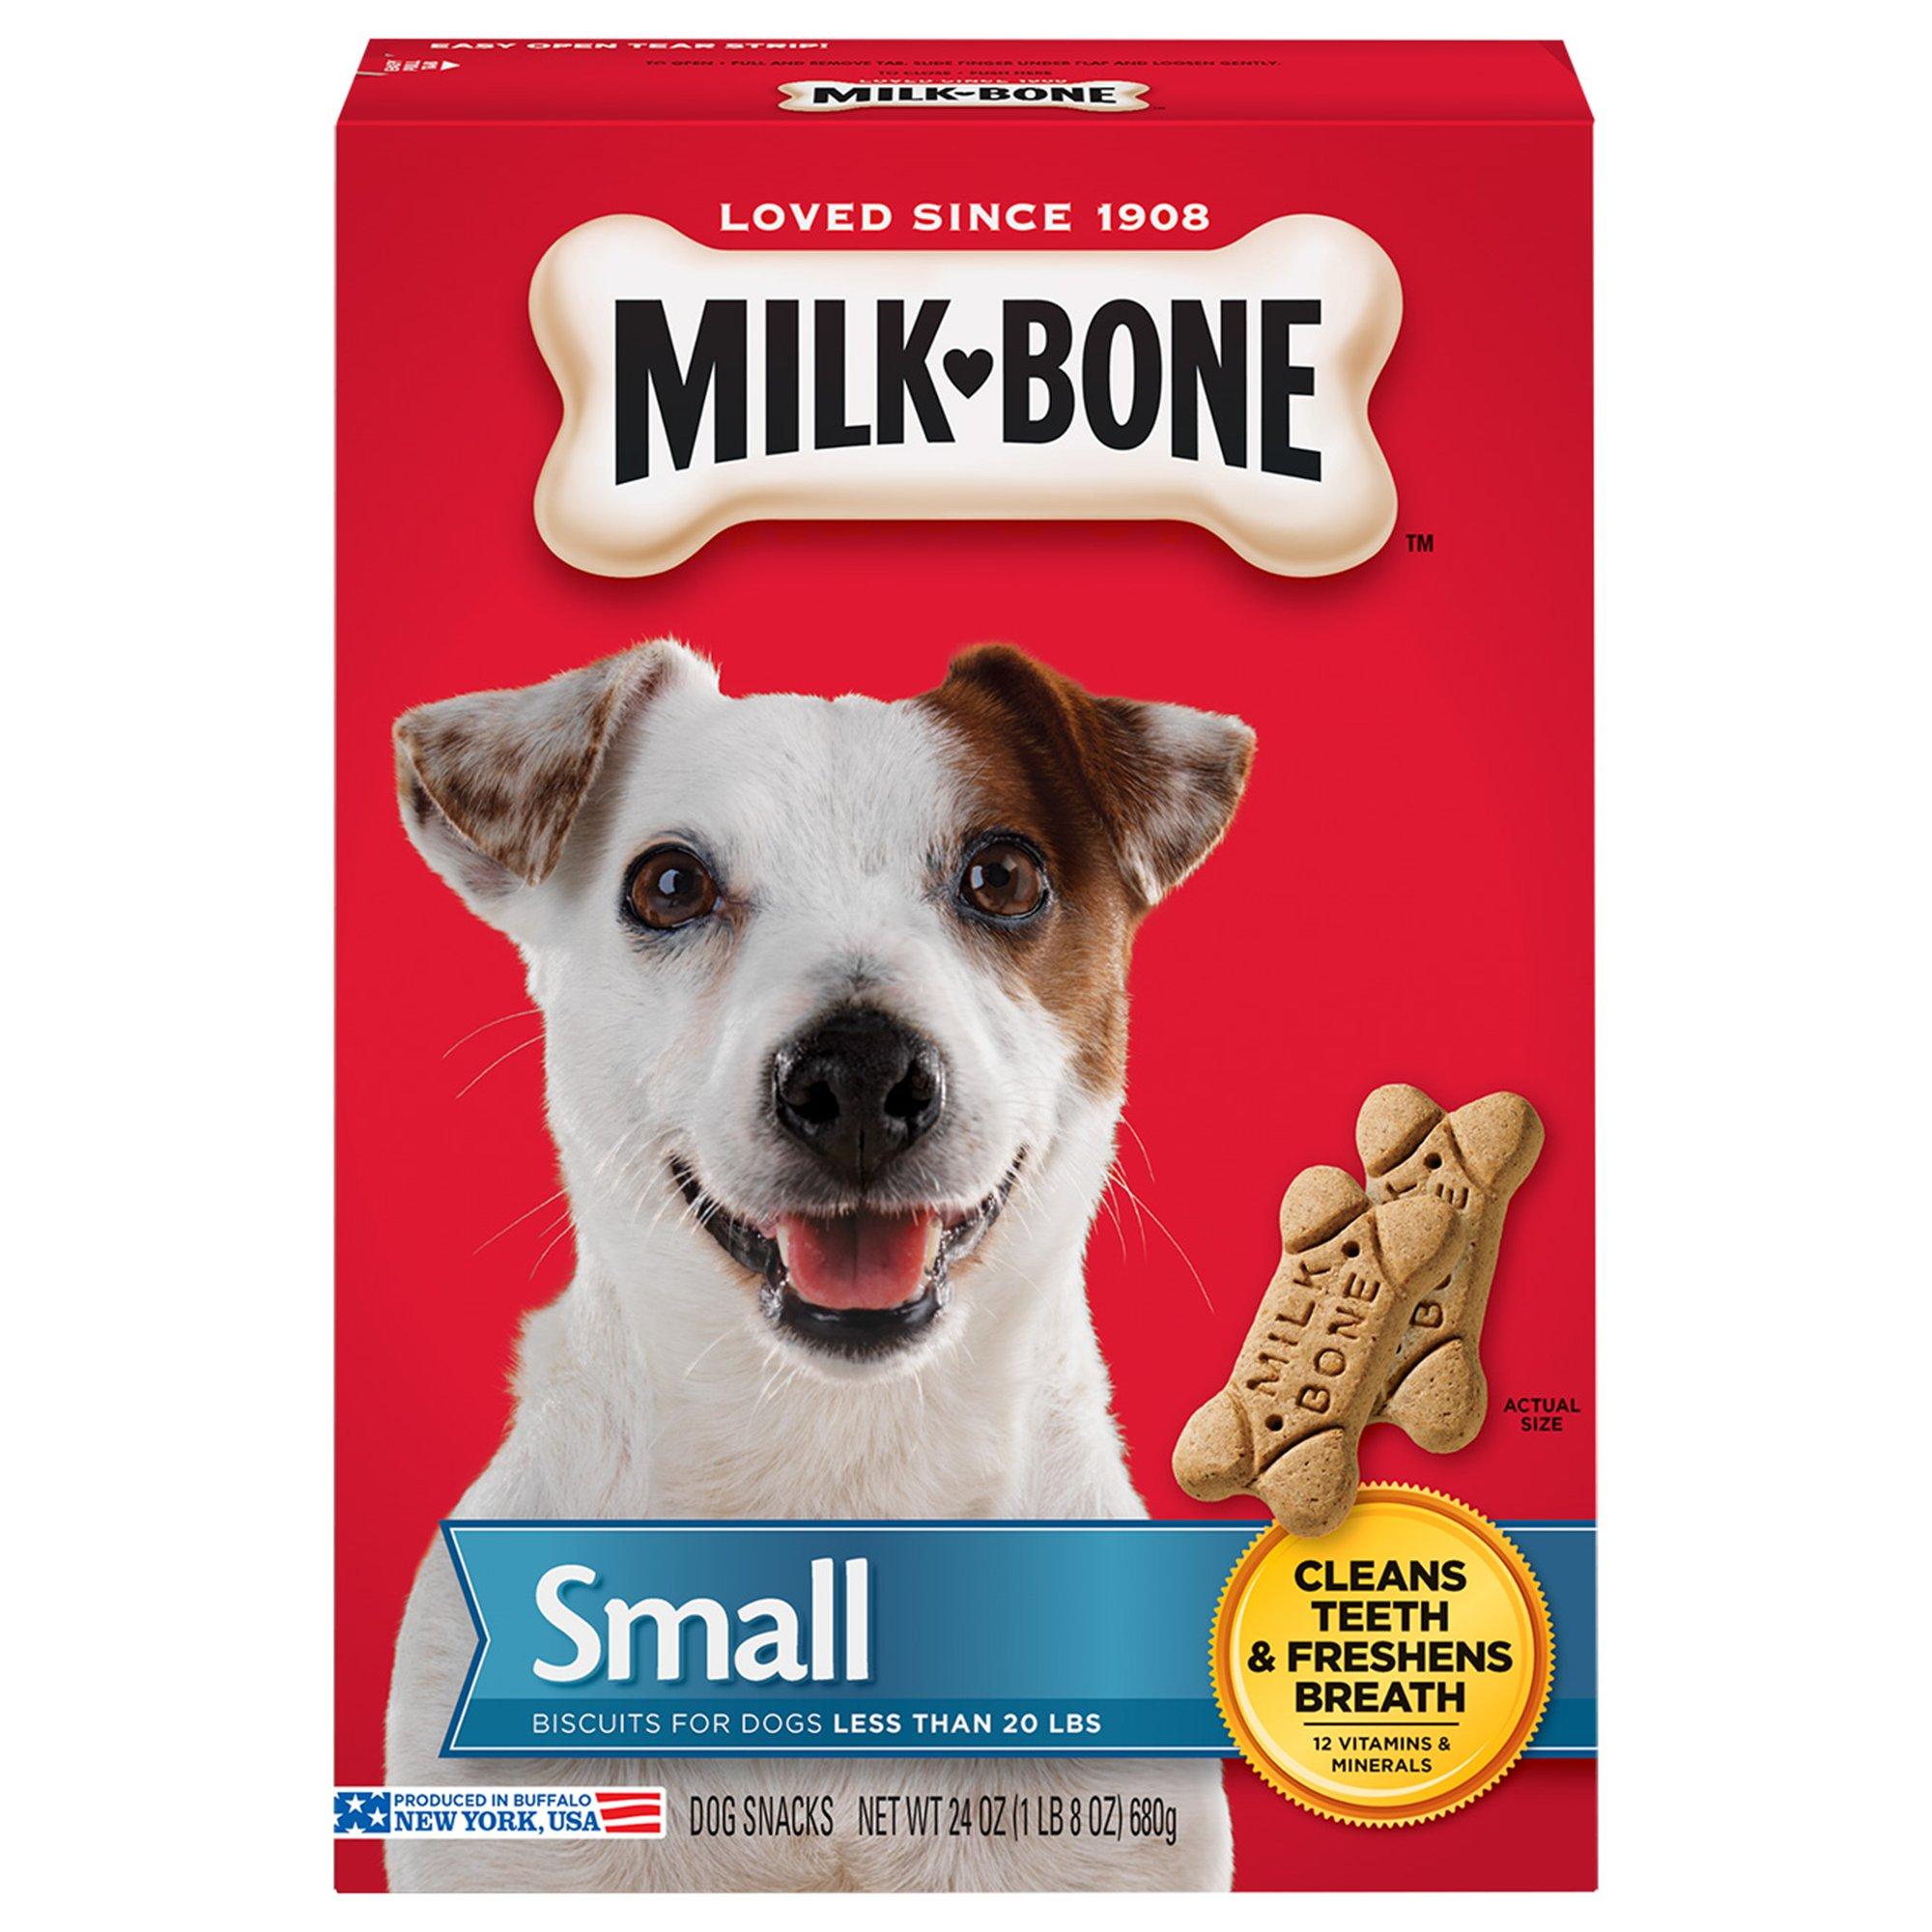 Milk-Bone Small Dog Biscuits